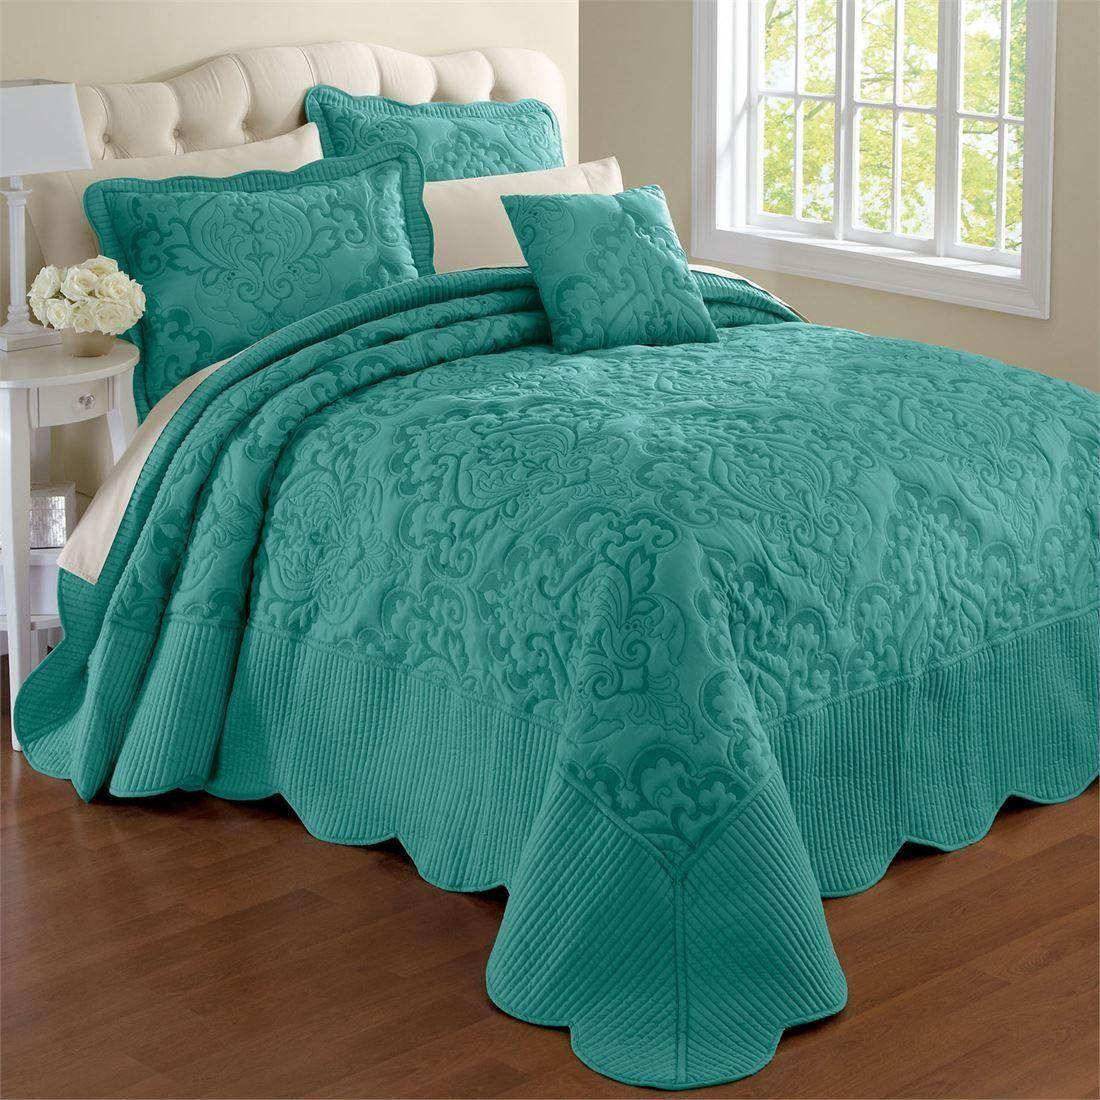 Best Boys Girls Kids Twin Bedding Sets Sale Bedroom Turquoise 400 x 300